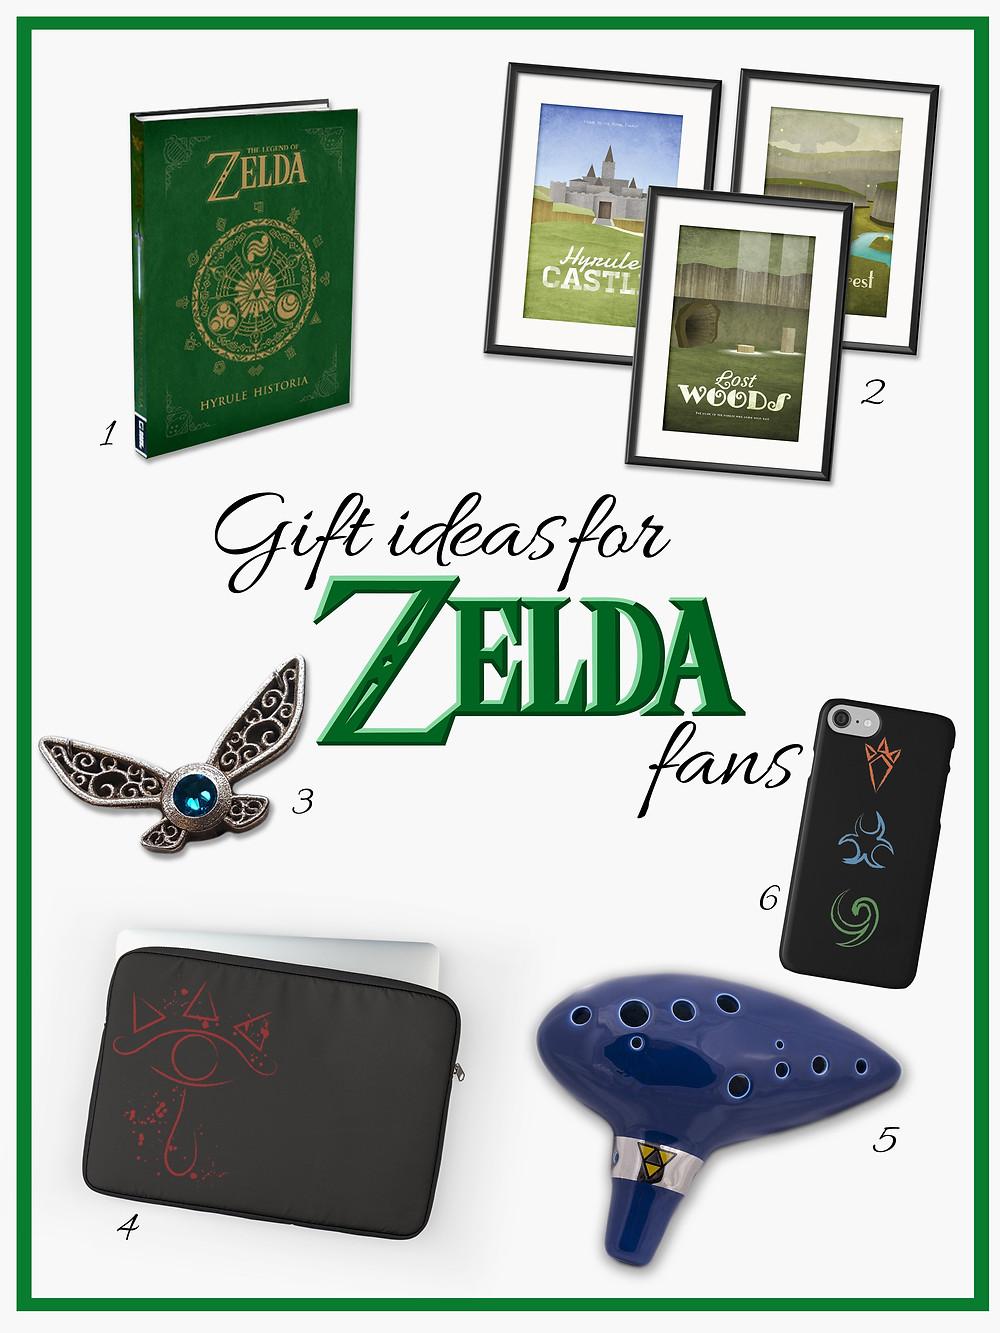 Gift ideas for Zelda fans